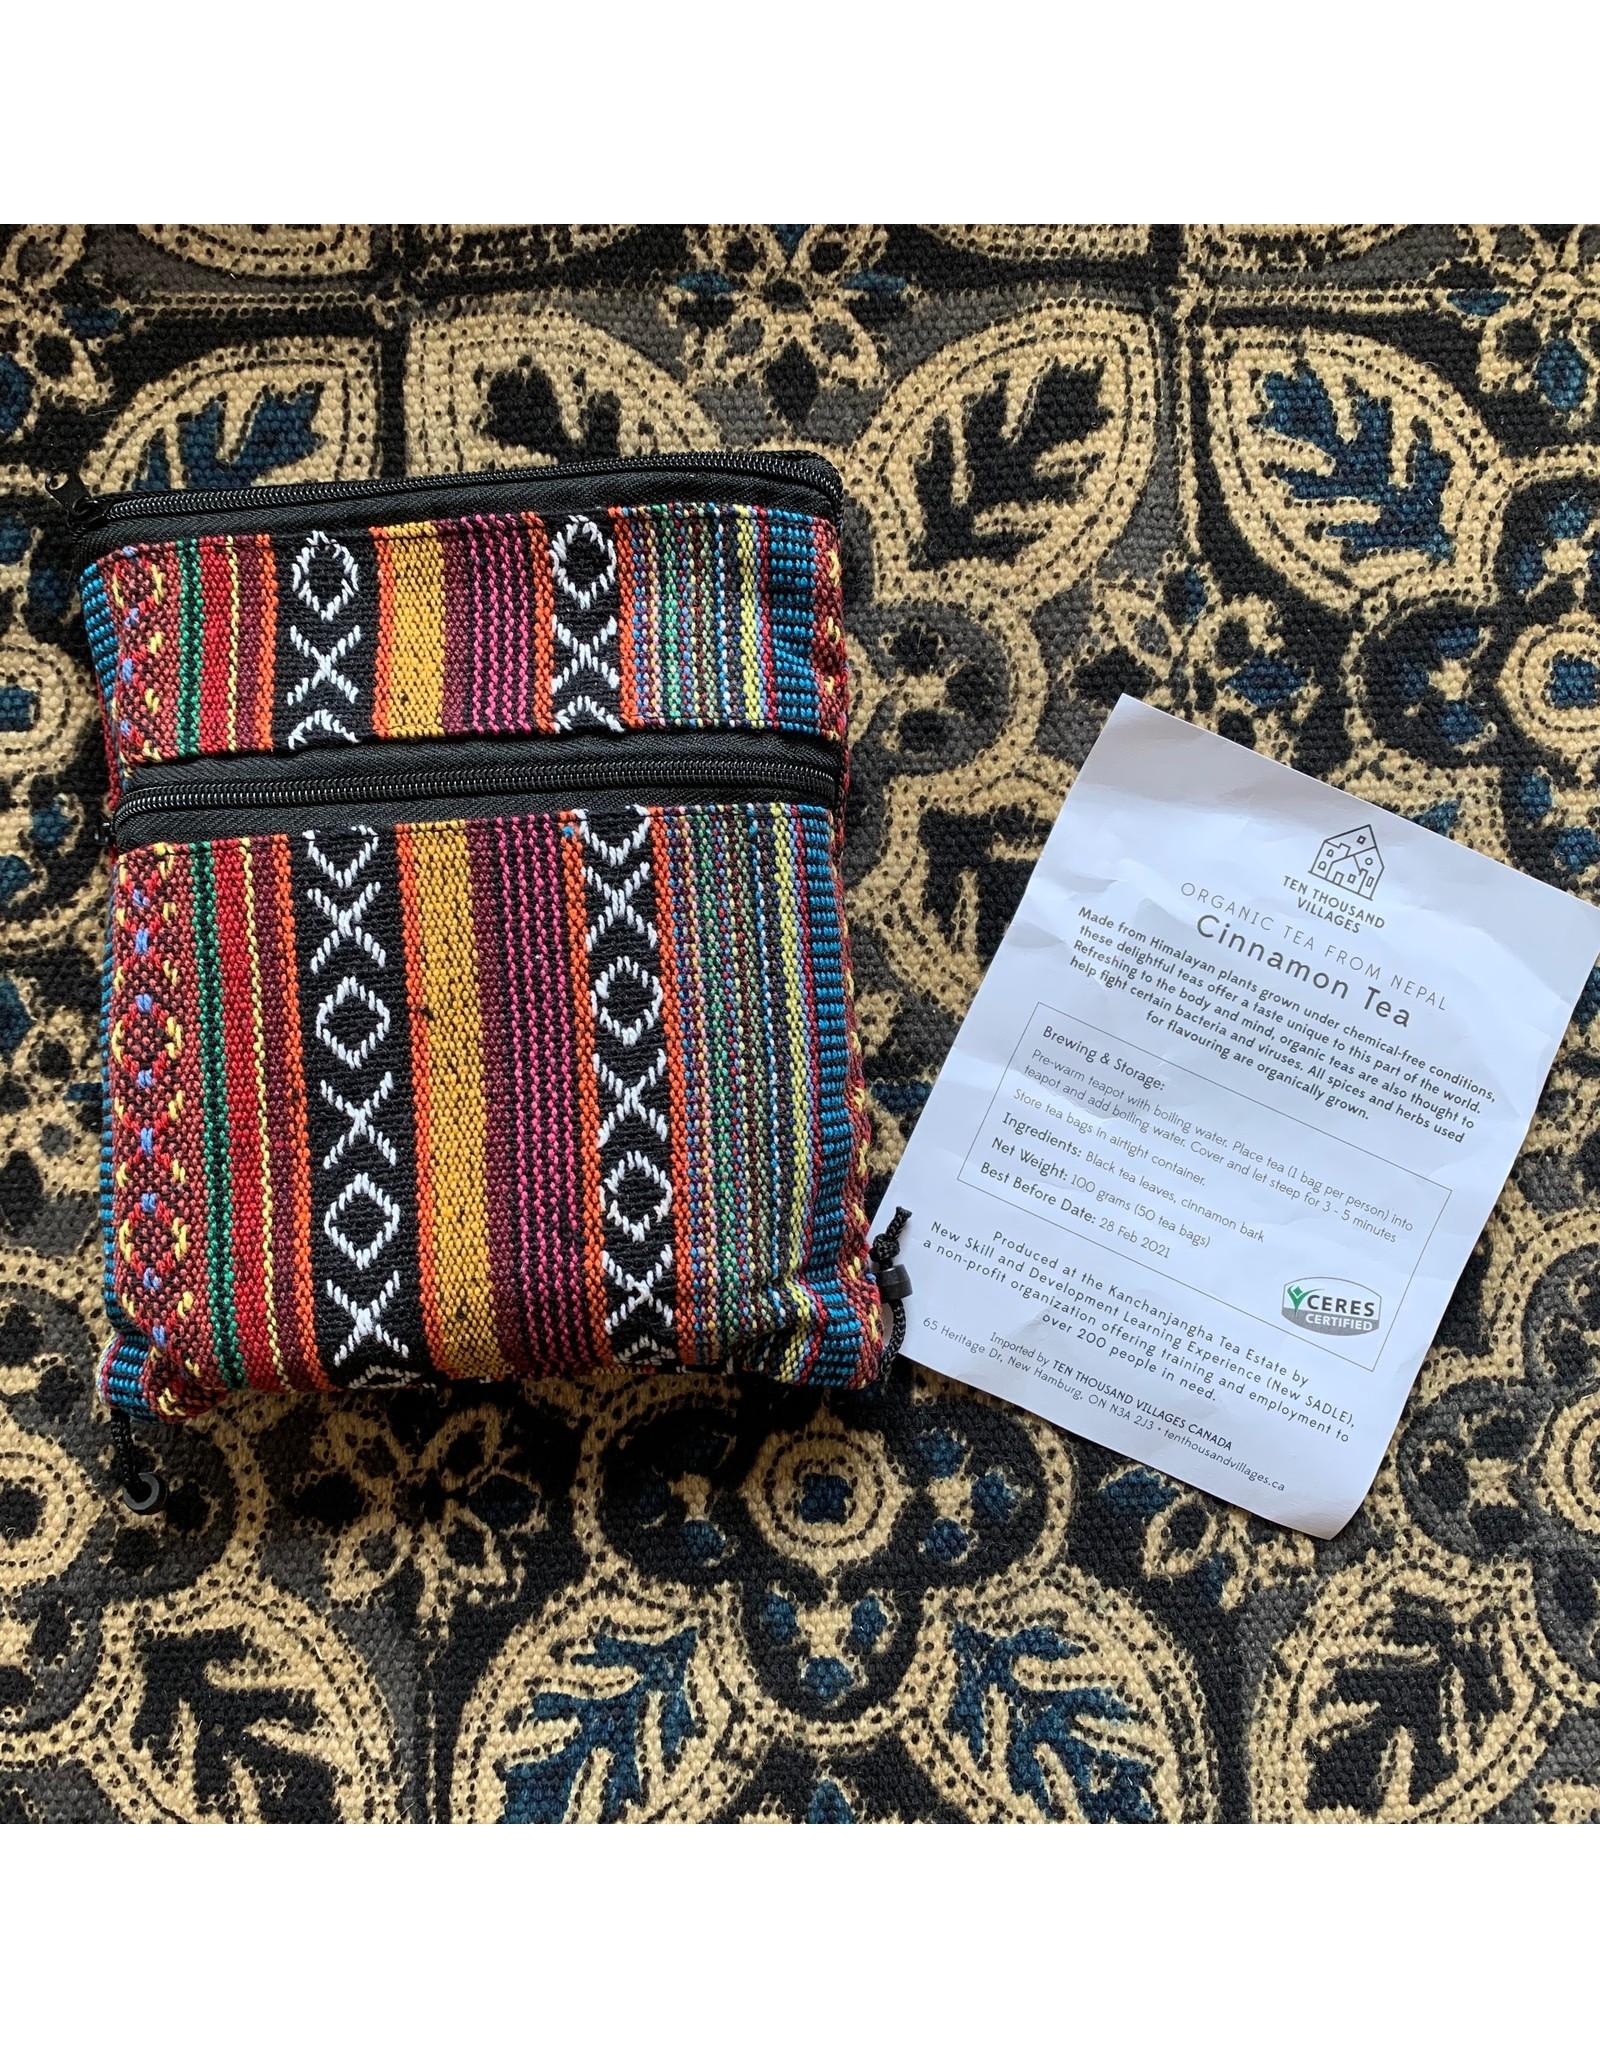 Ten Thousand Villages Himalayan Cinnamon Tea in Bag